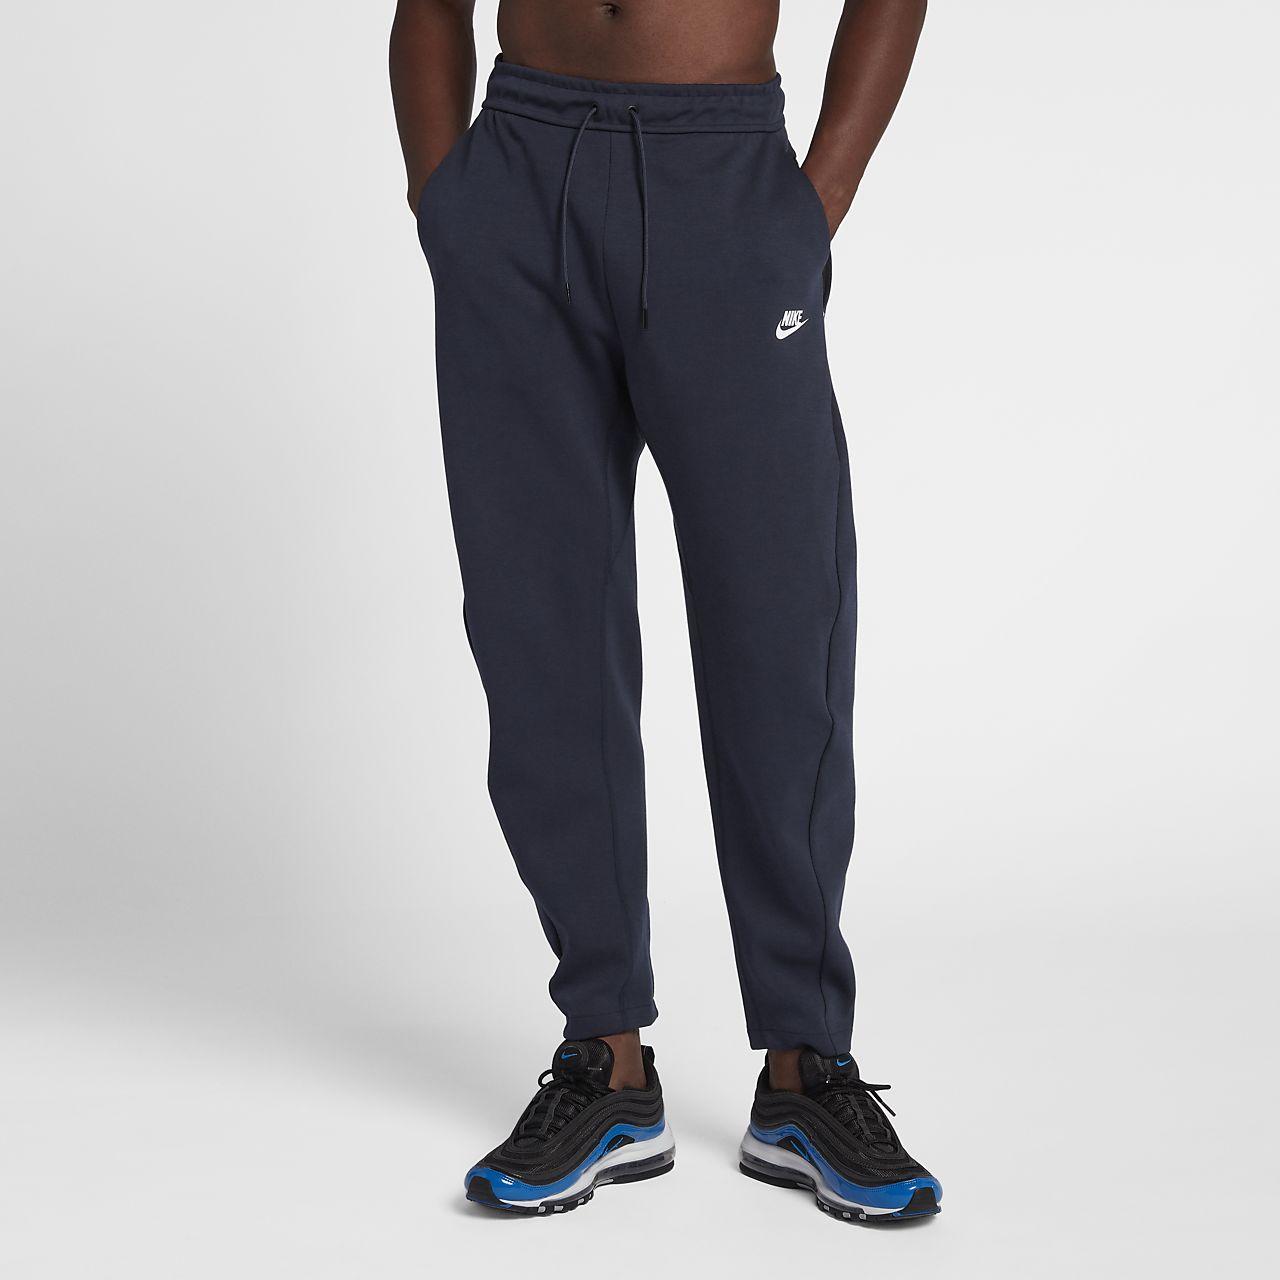 huge discount f03c5 84a6e Nike Sportswear Tech Fleece - bukser til mænd